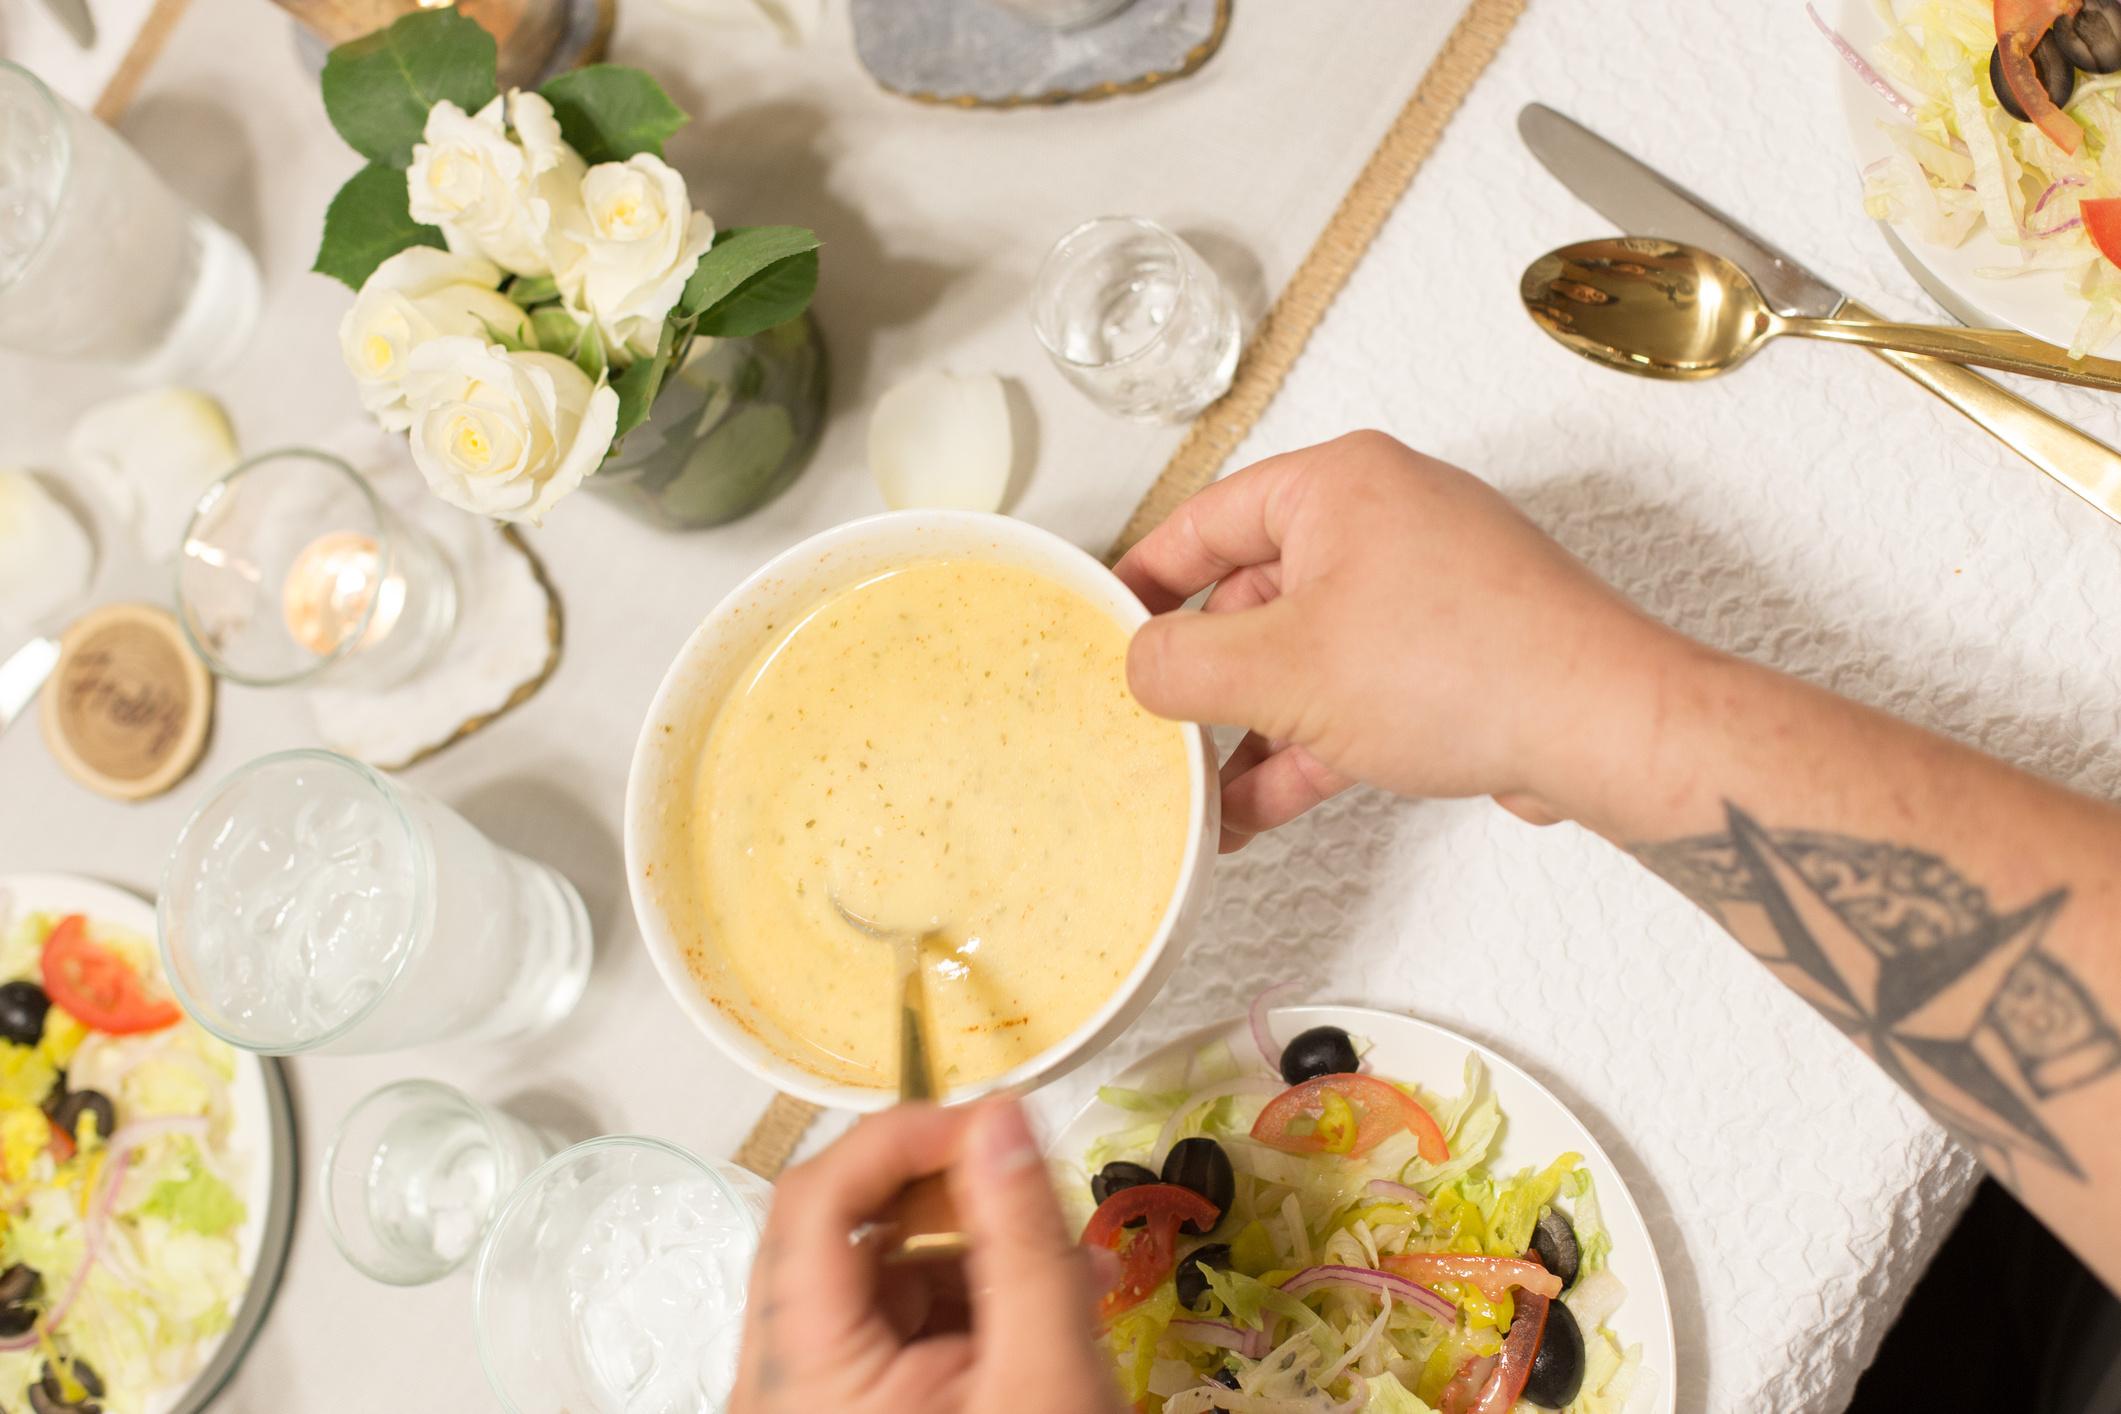 Olive Garden Salad With Spicy Olive Garden Dressing Selena Week Sweet Life